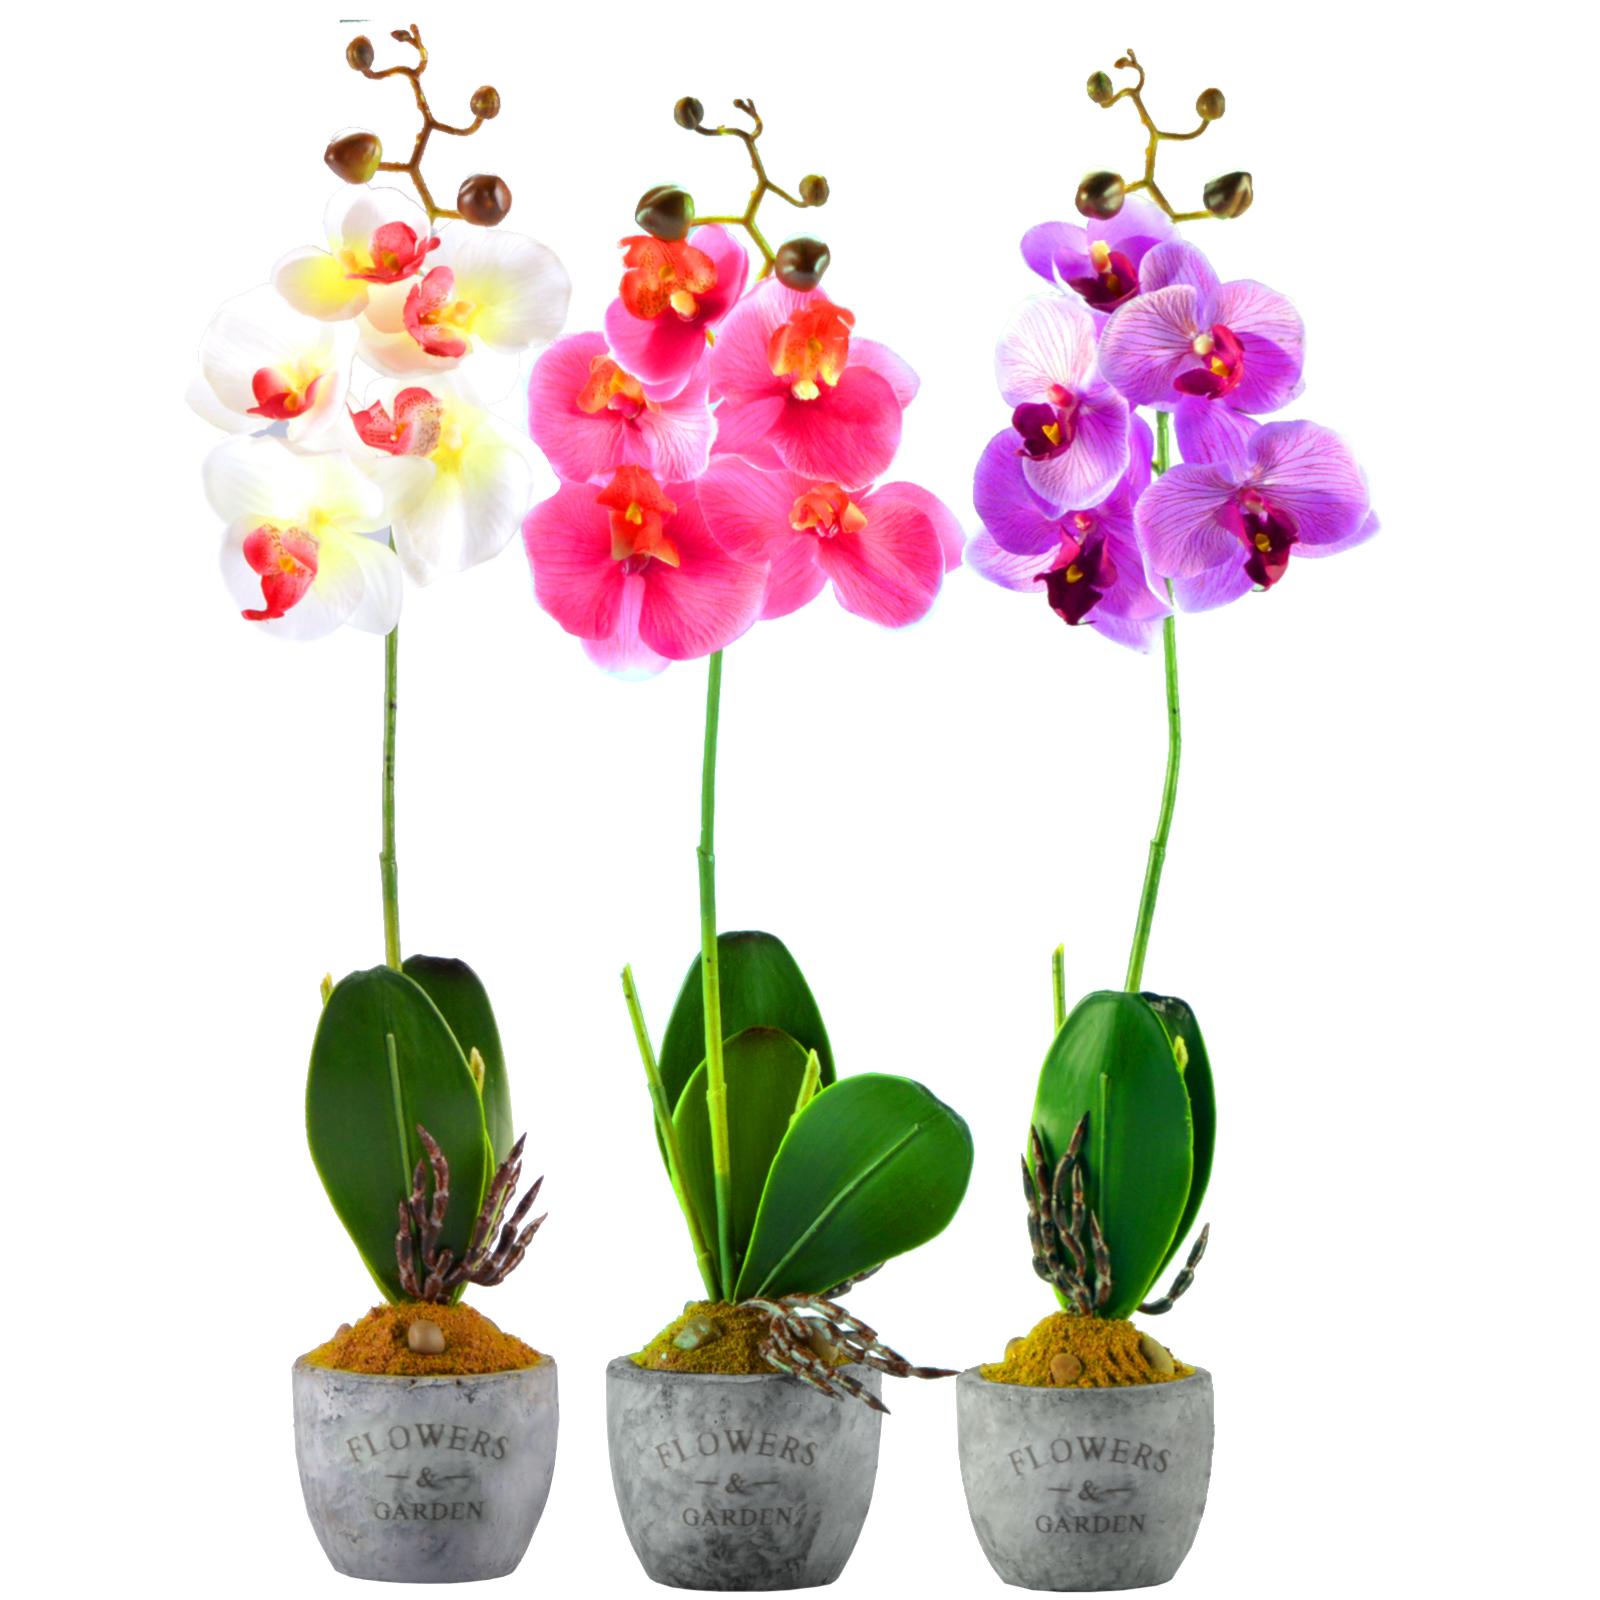 flowers 3 farben orchidee k nstlich orchidee im topf kunstblume blume blumentopf ebay. Black Bedroom Furniture Sets. Home Design Ideas